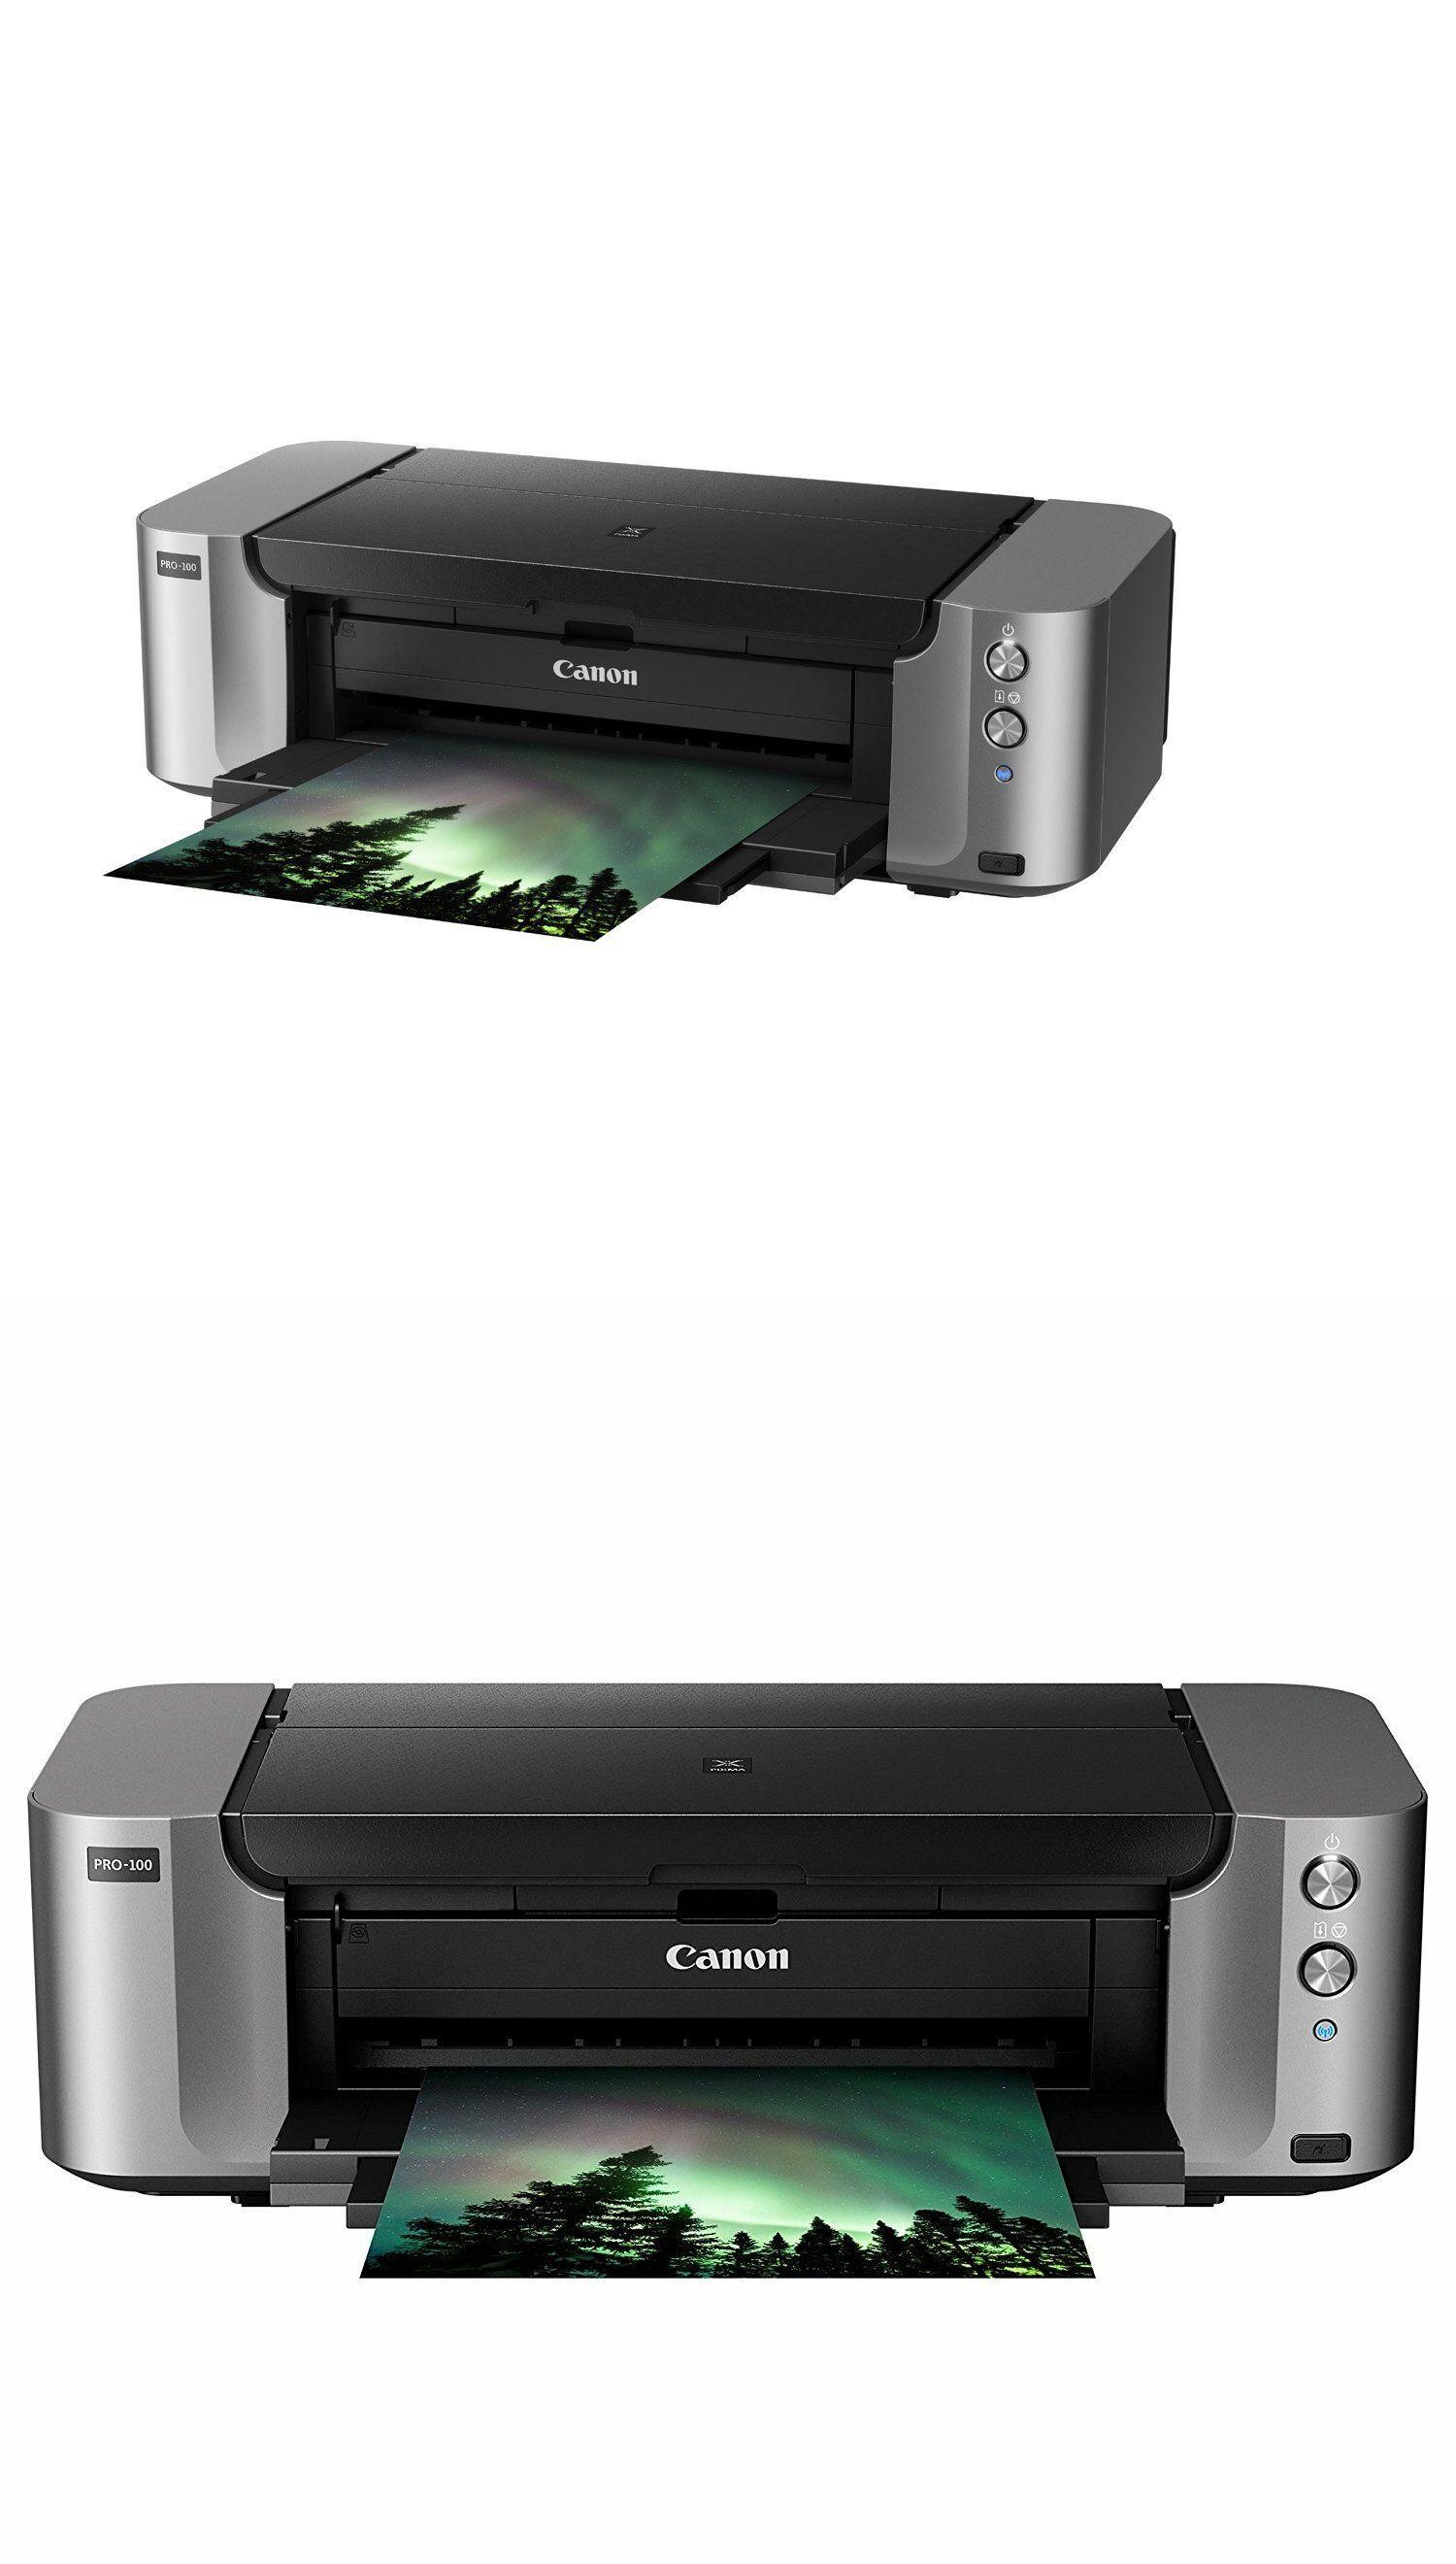 Printers 1245 Canon Pixma Pro 100 Wireless Digital Photo Inkjet